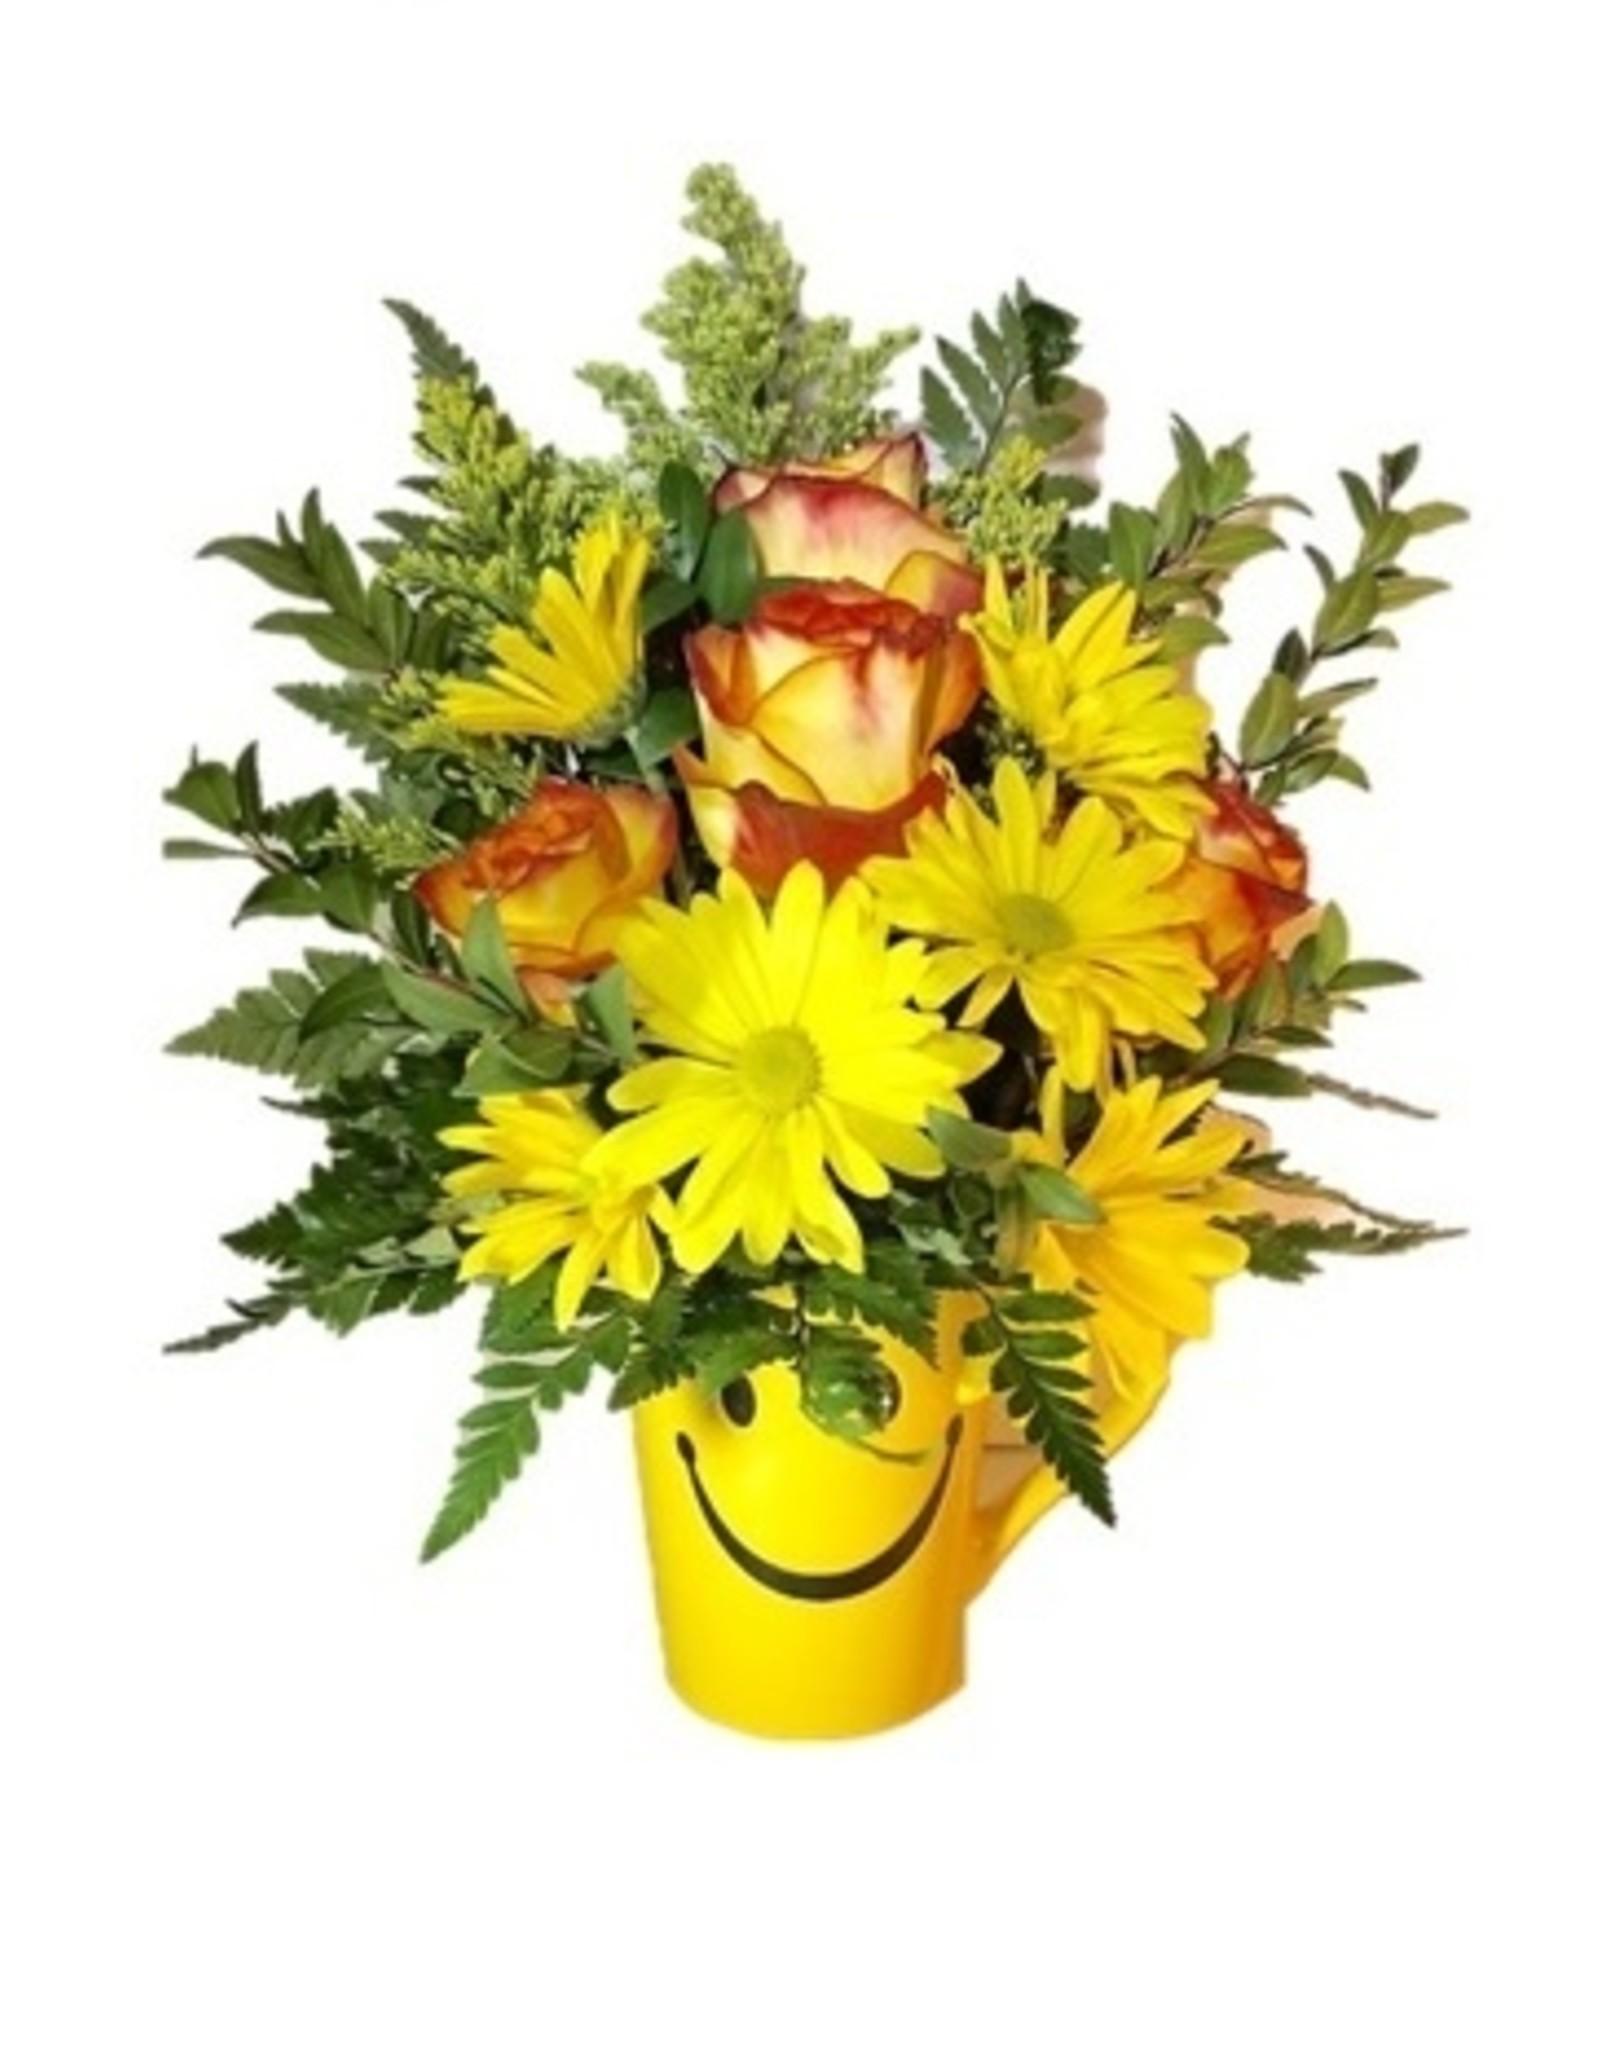 CERAMIC SMILEY MUG FLOWER ARRANGEMENT